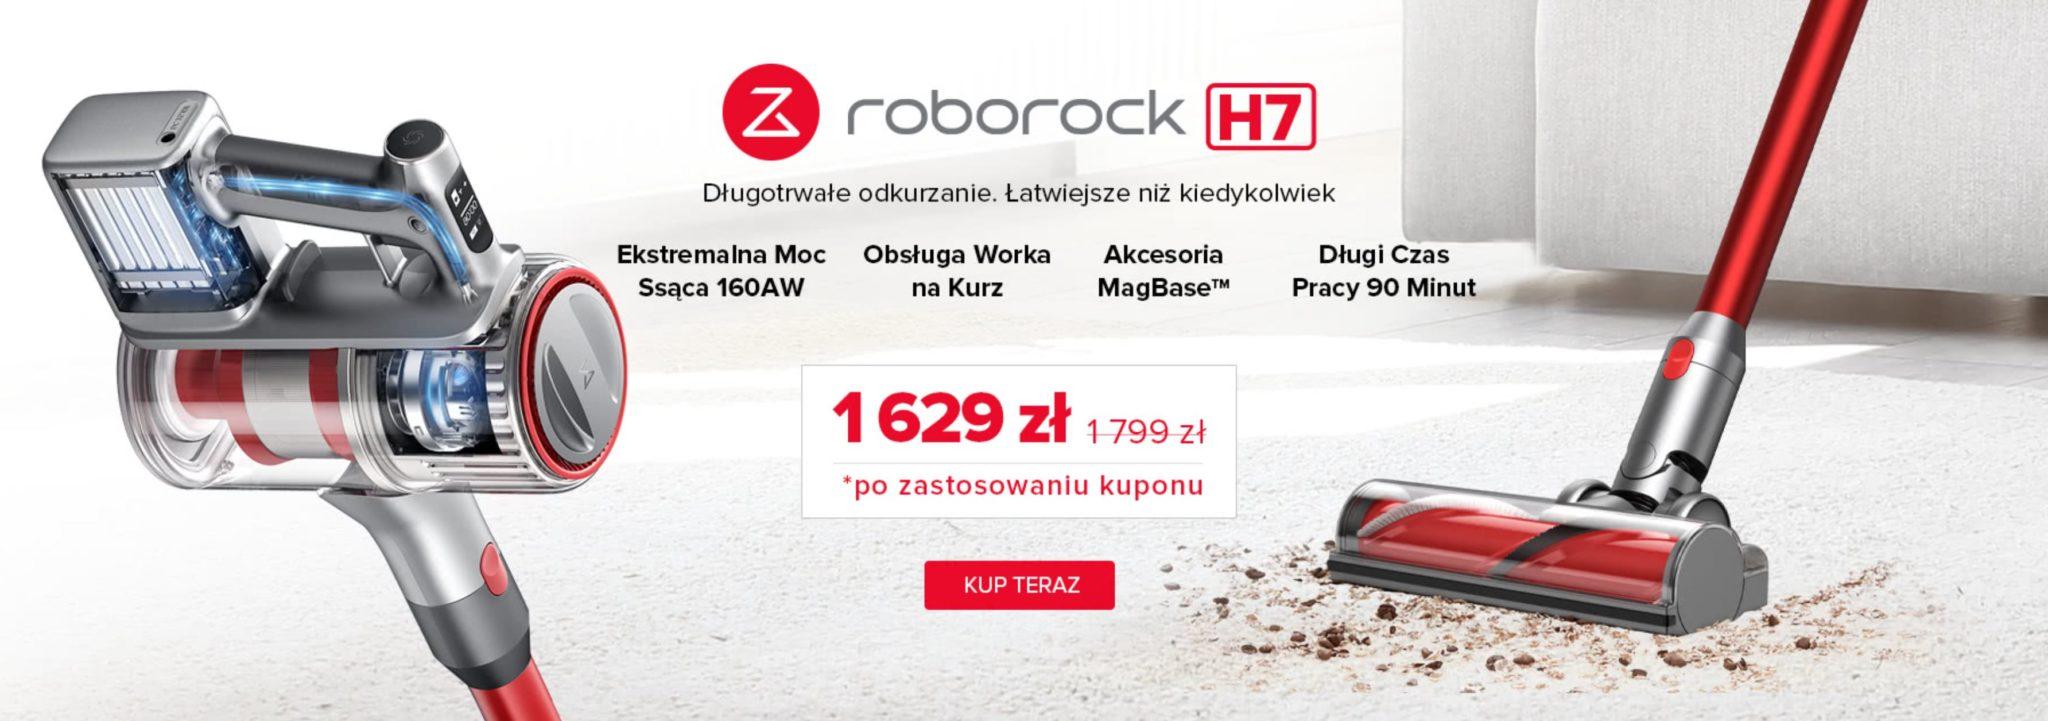 Roborock H7 w promocji